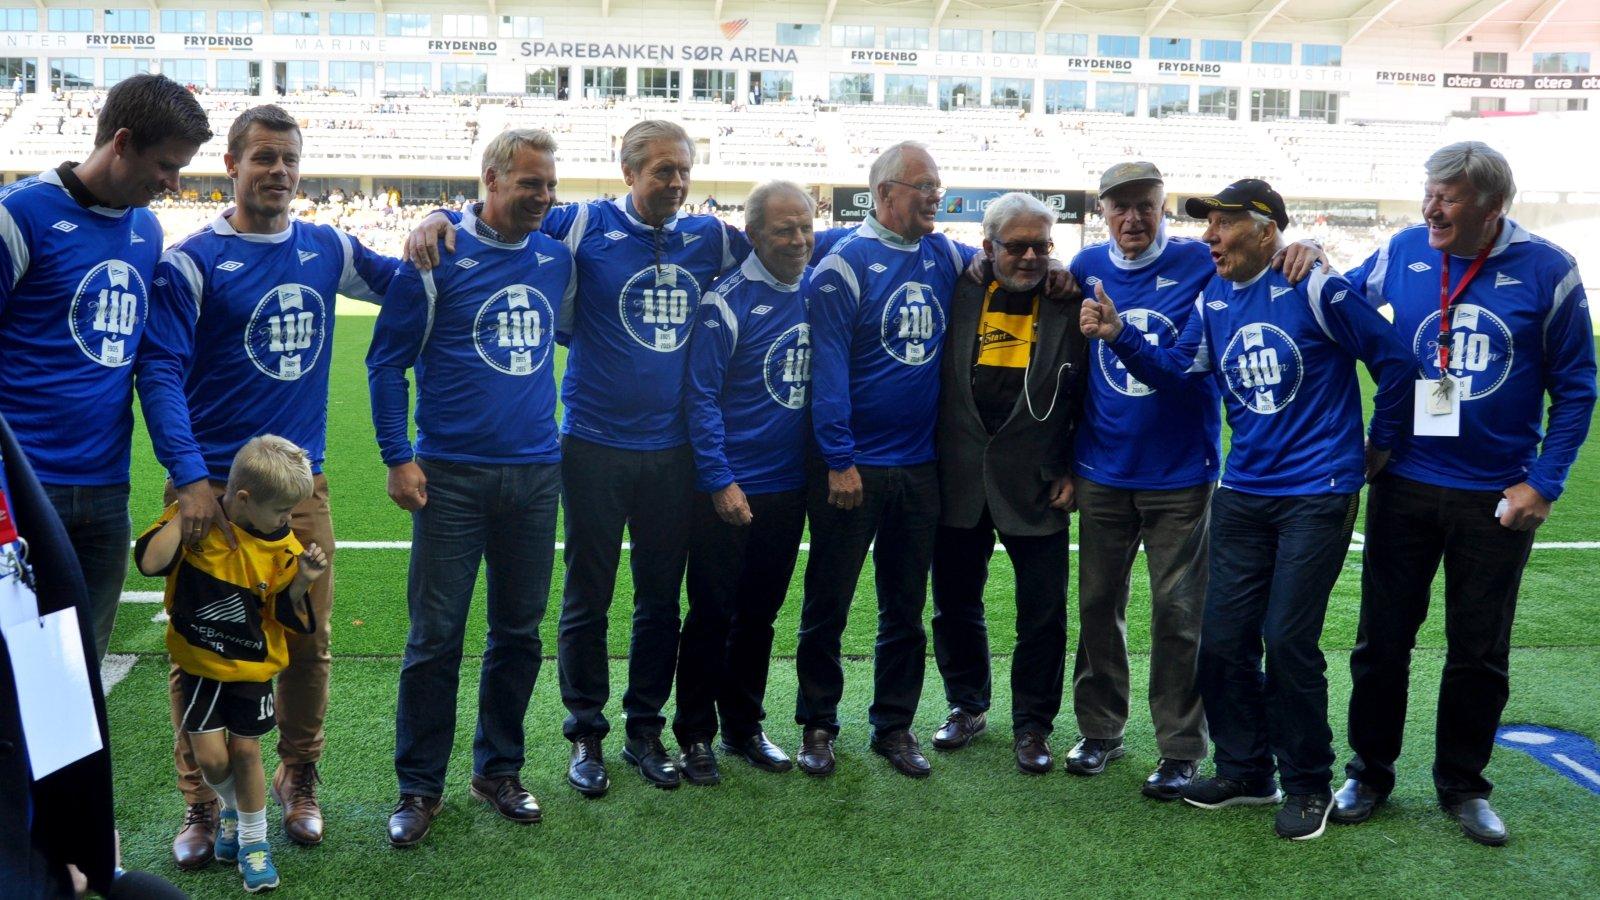 Karsten Johannesen, Egil Gundersen, Harald Båsland, Trond Pedersen, Roald Rørheim, Claus Eftevaag, Marius Johnsen, Jesper Mathisen, Per Svein Bostrøm, Jubileumskamp 2015